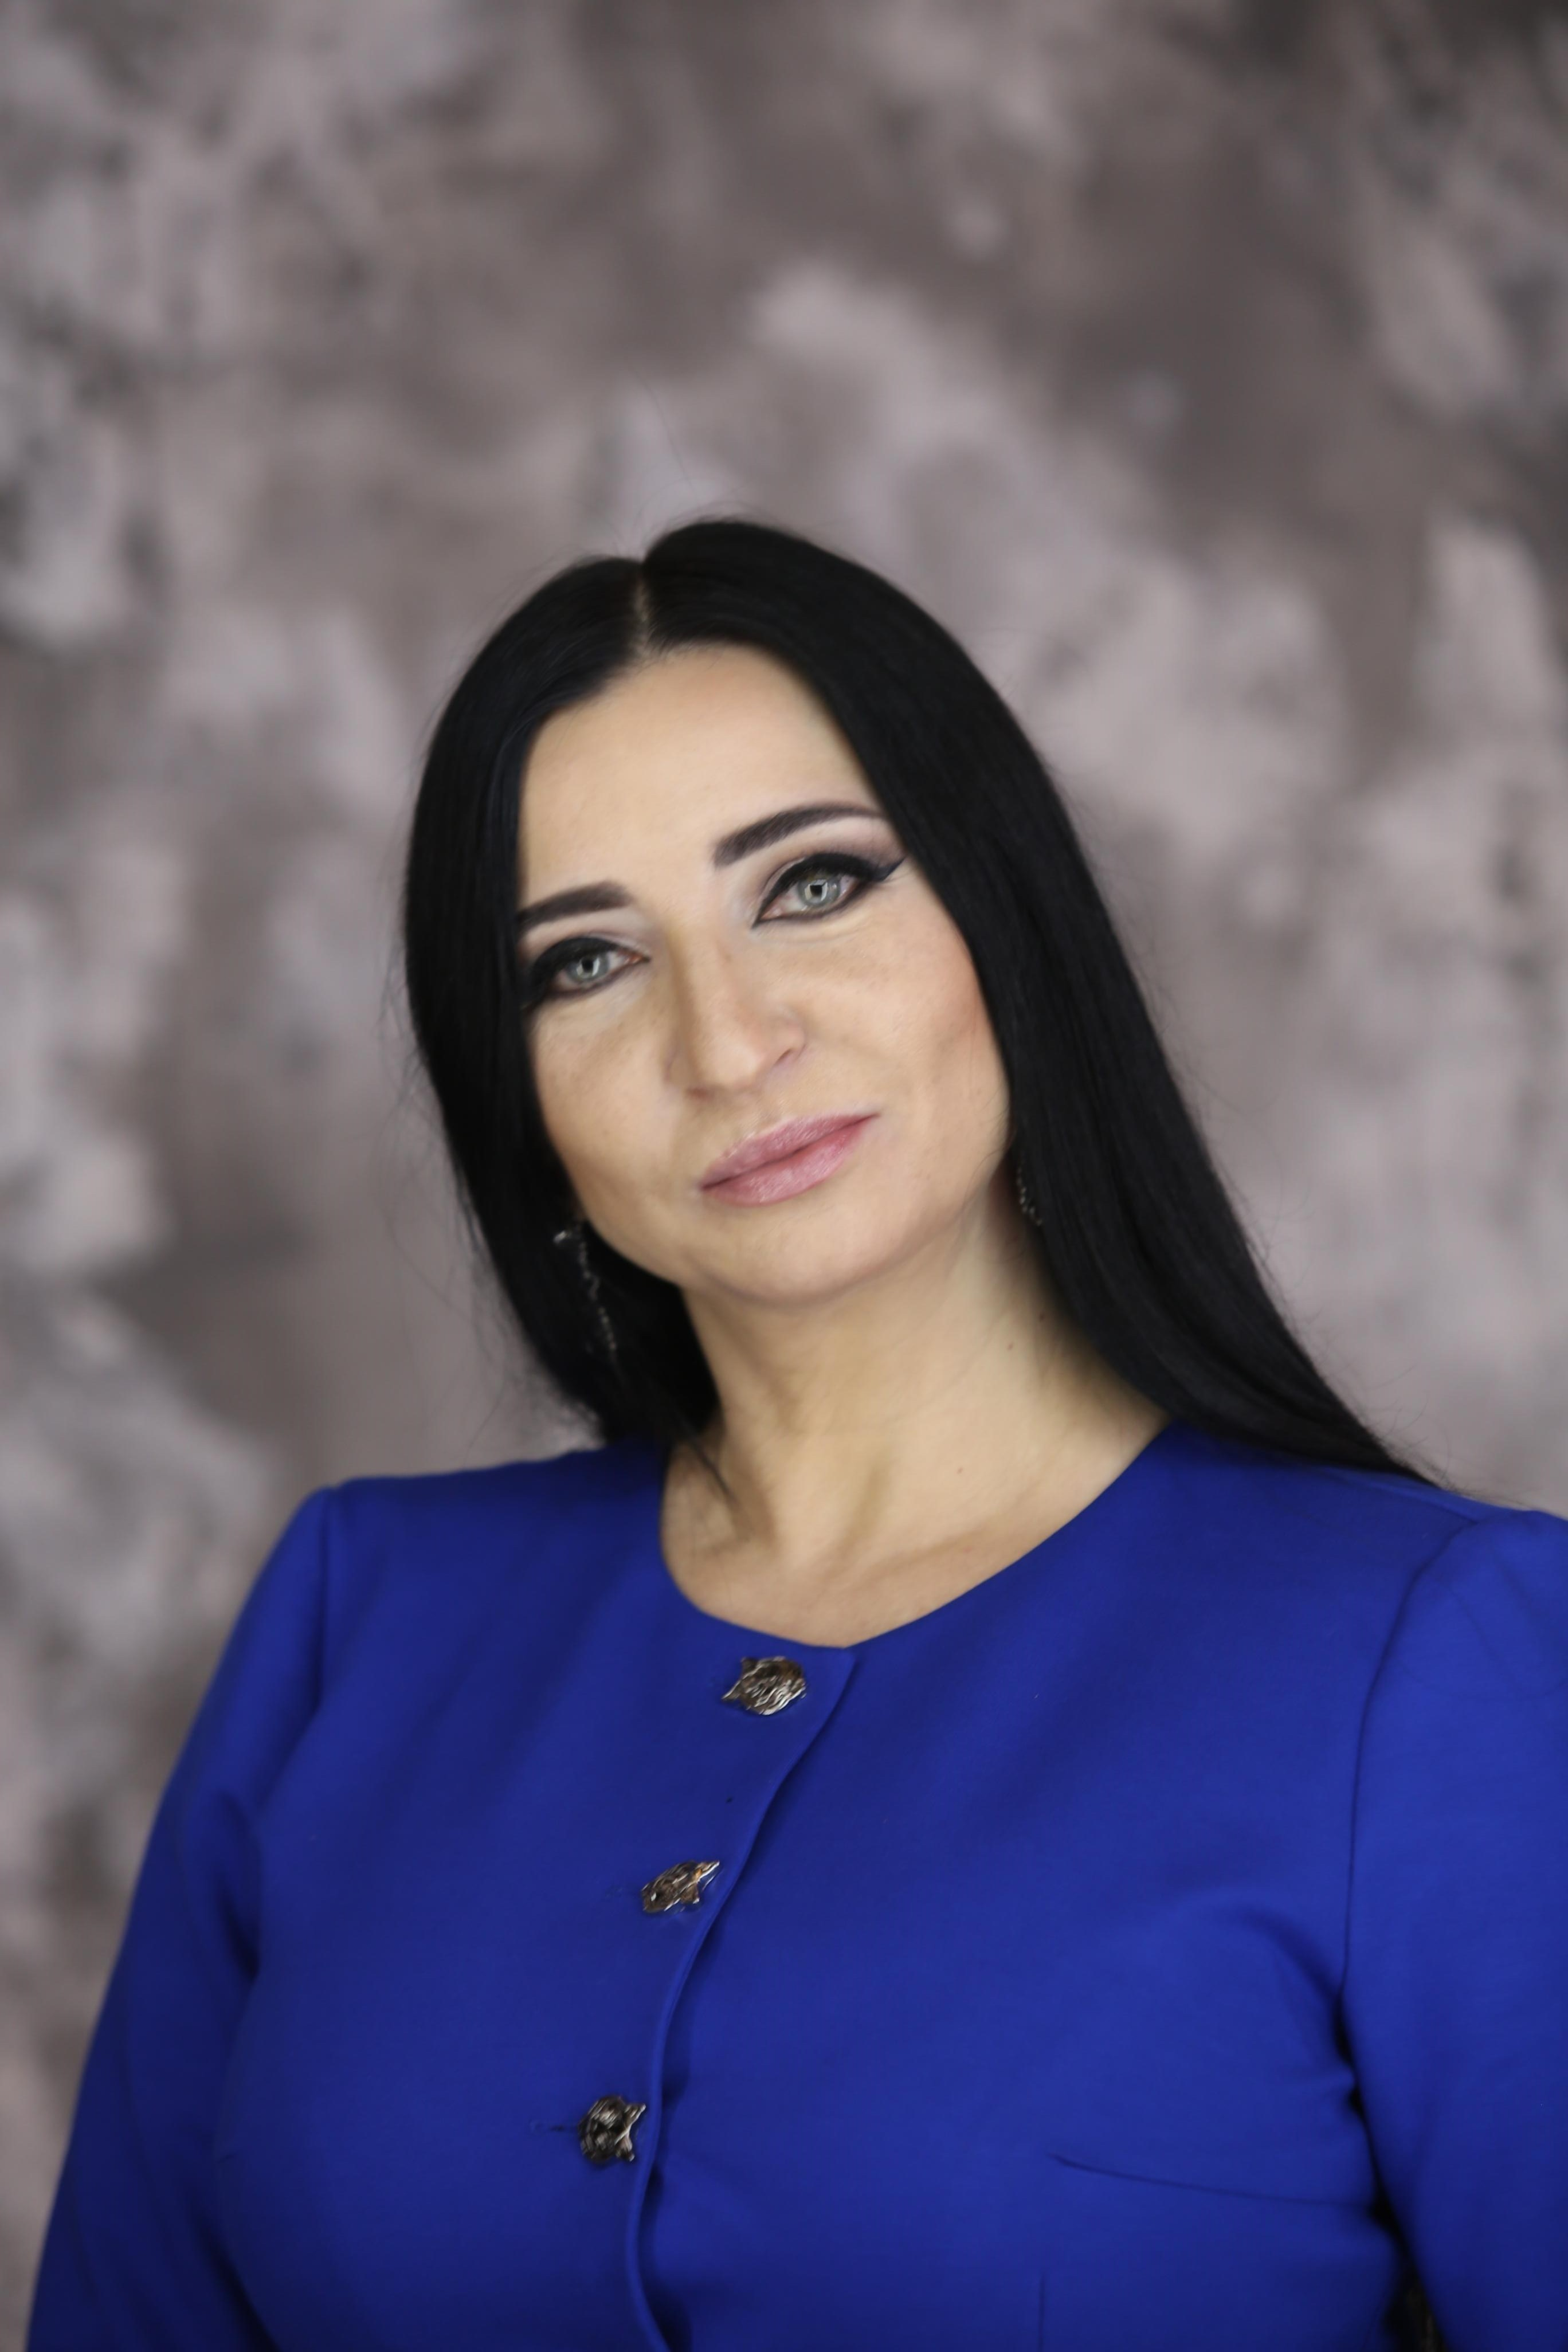 Марианна Абравитова, таролог, ясновидящая